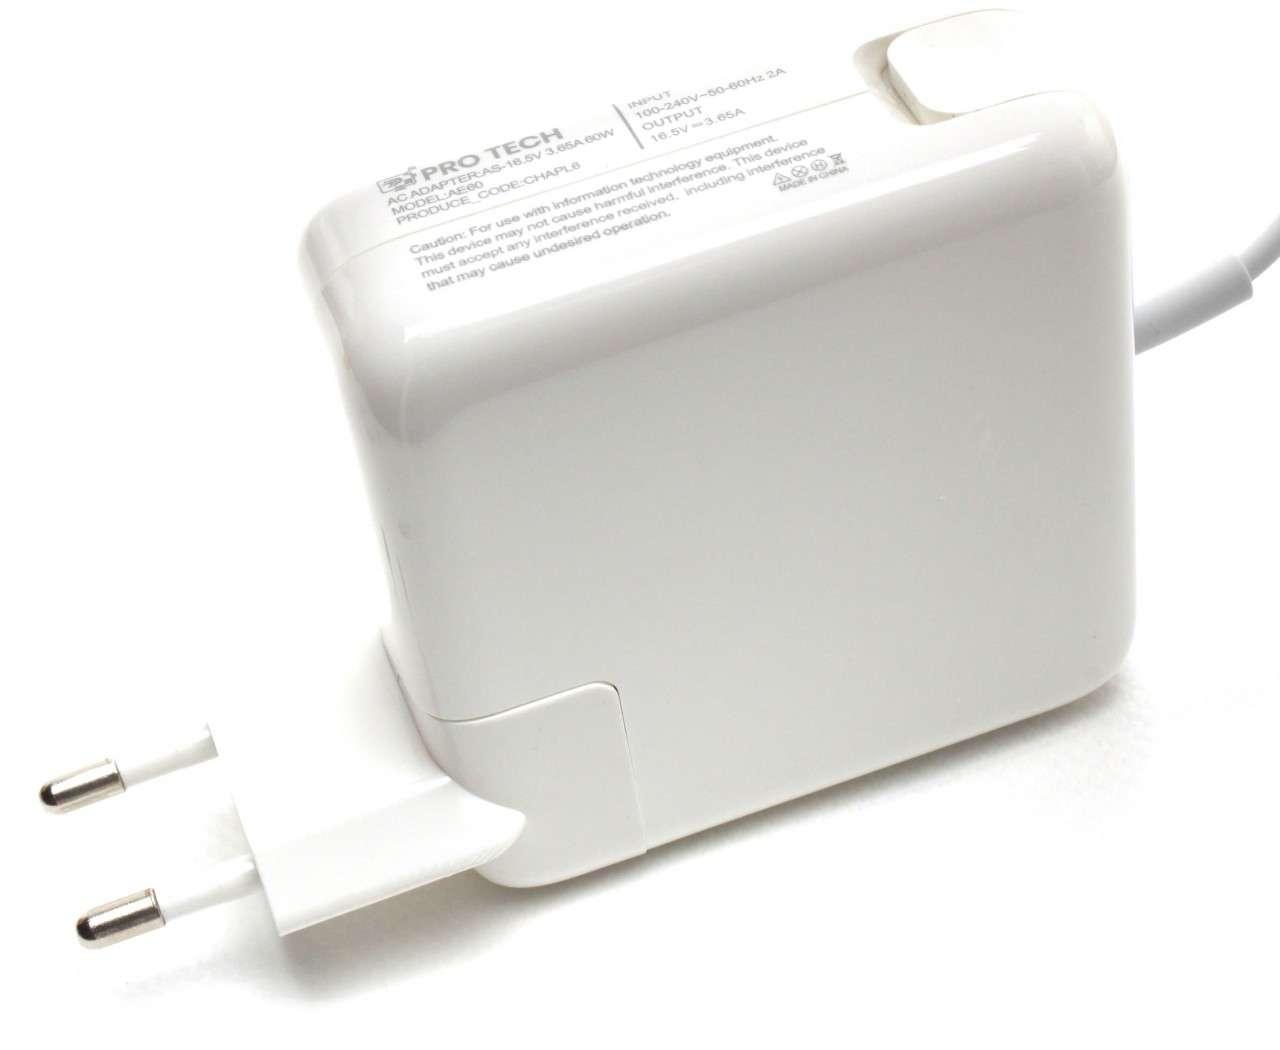 Incarcator Apple MacBook MA538LLA Replacement imagine powerlaptop.ro 2021